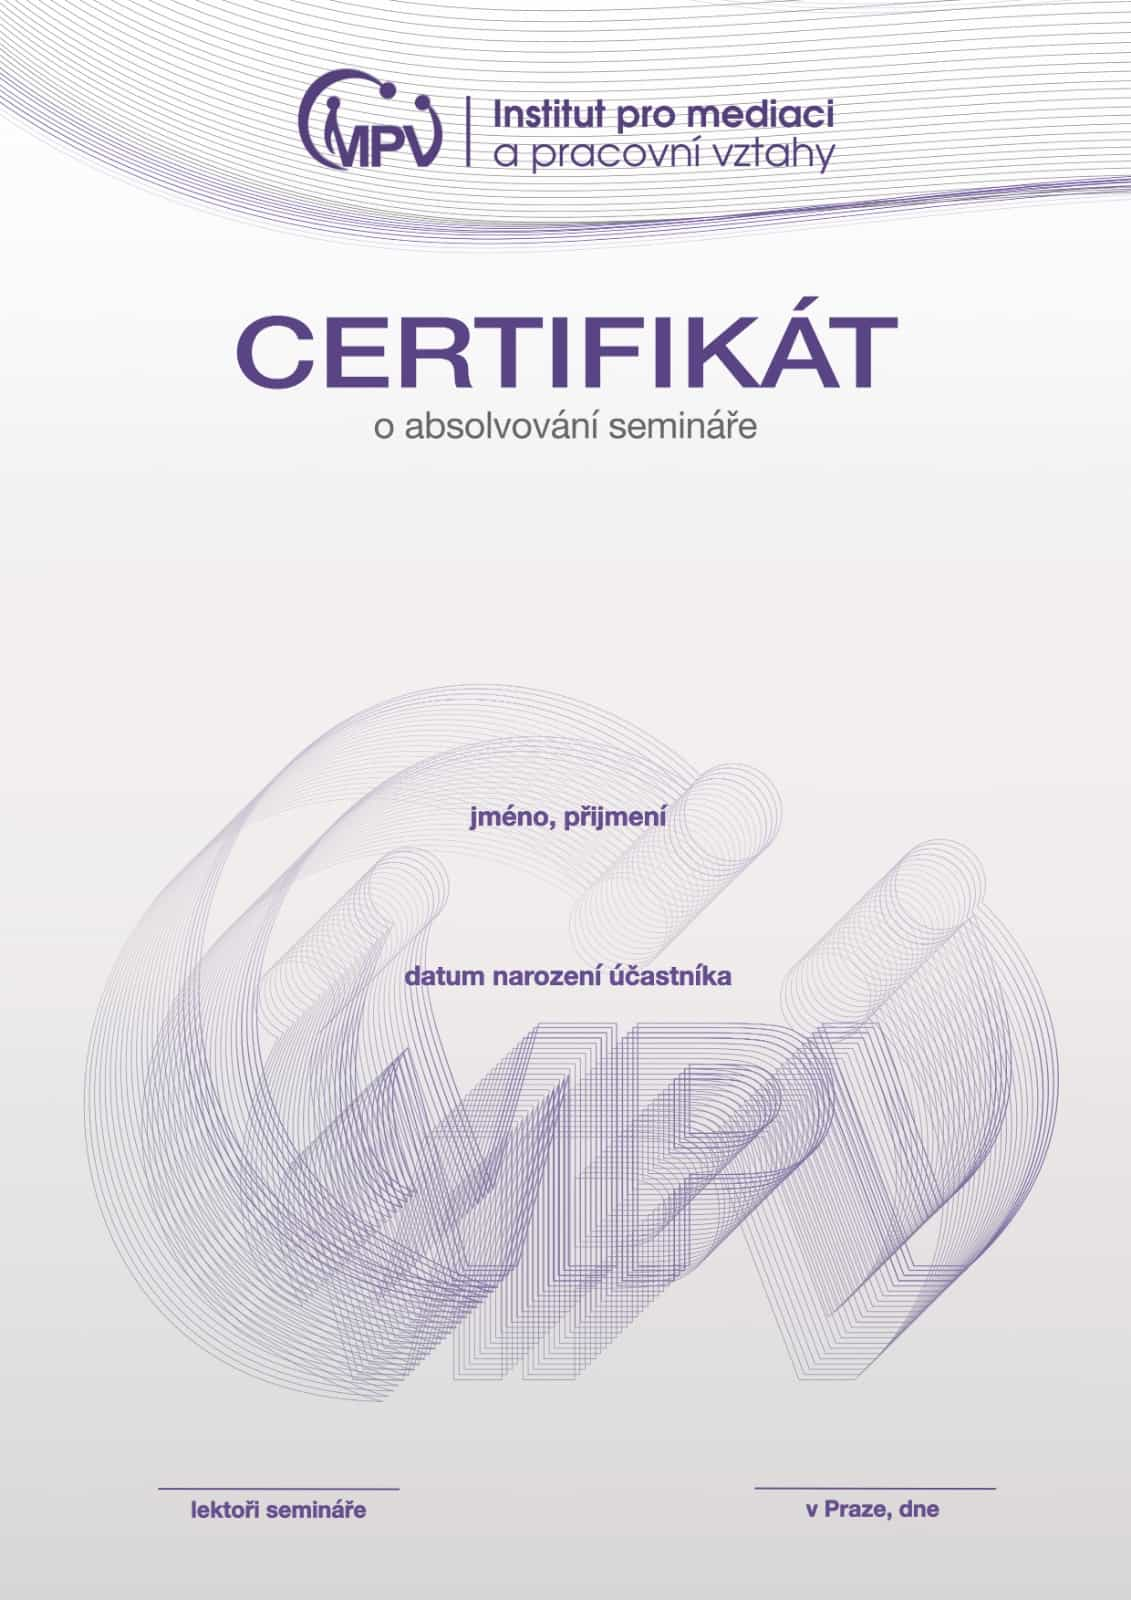 certifikat_impv